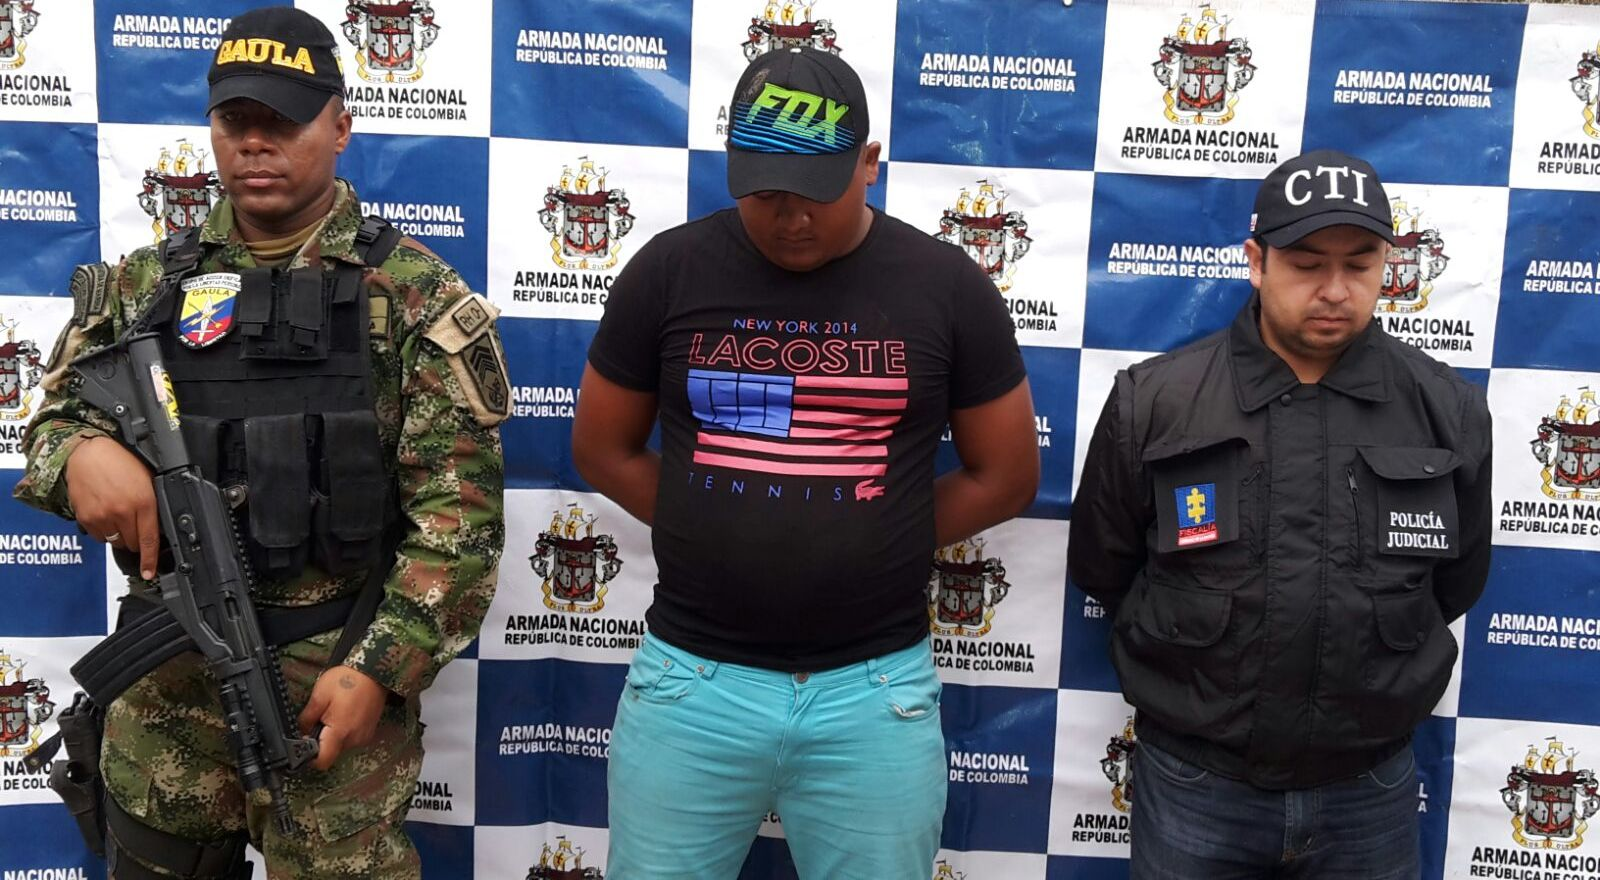 Armada Nacional capturó a dos presuntos miembros de redes de apoyo de las Farc